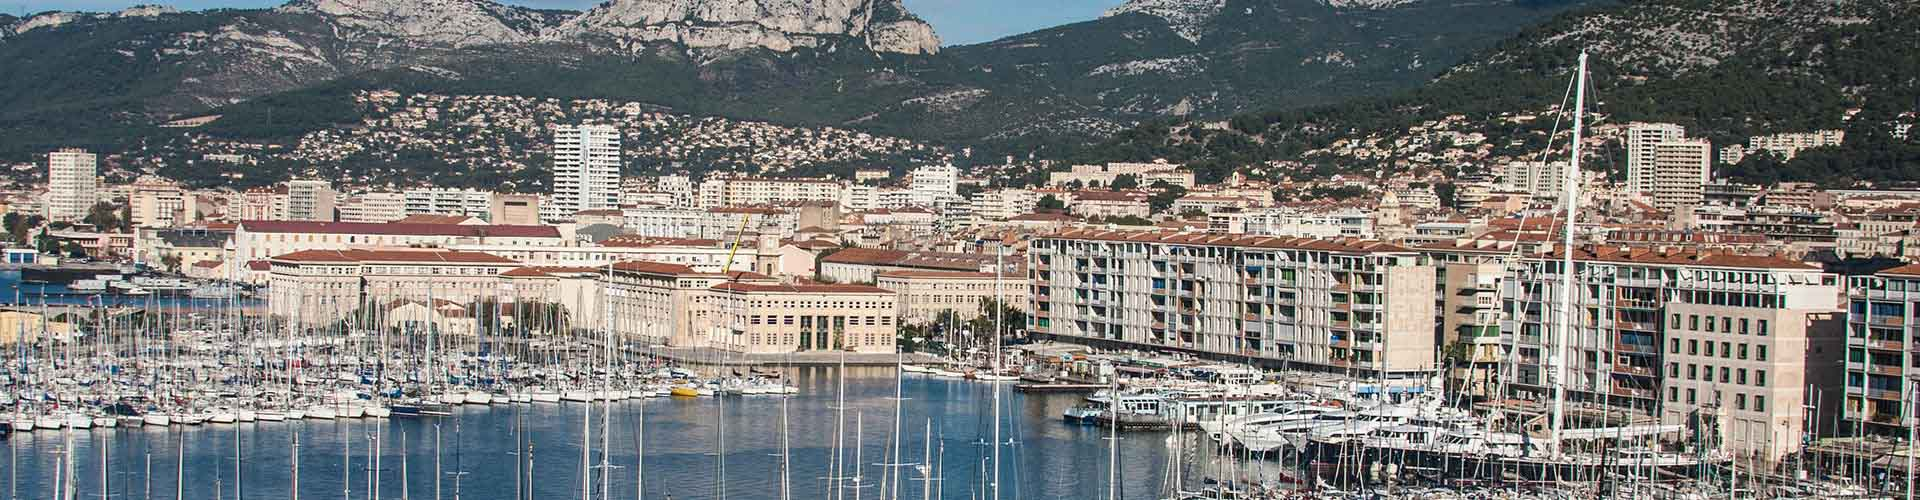 Toulon - Campamentos en Toulon. Mapas de Toulon, Fotos y comentarios de cada Campamento en Toulon.